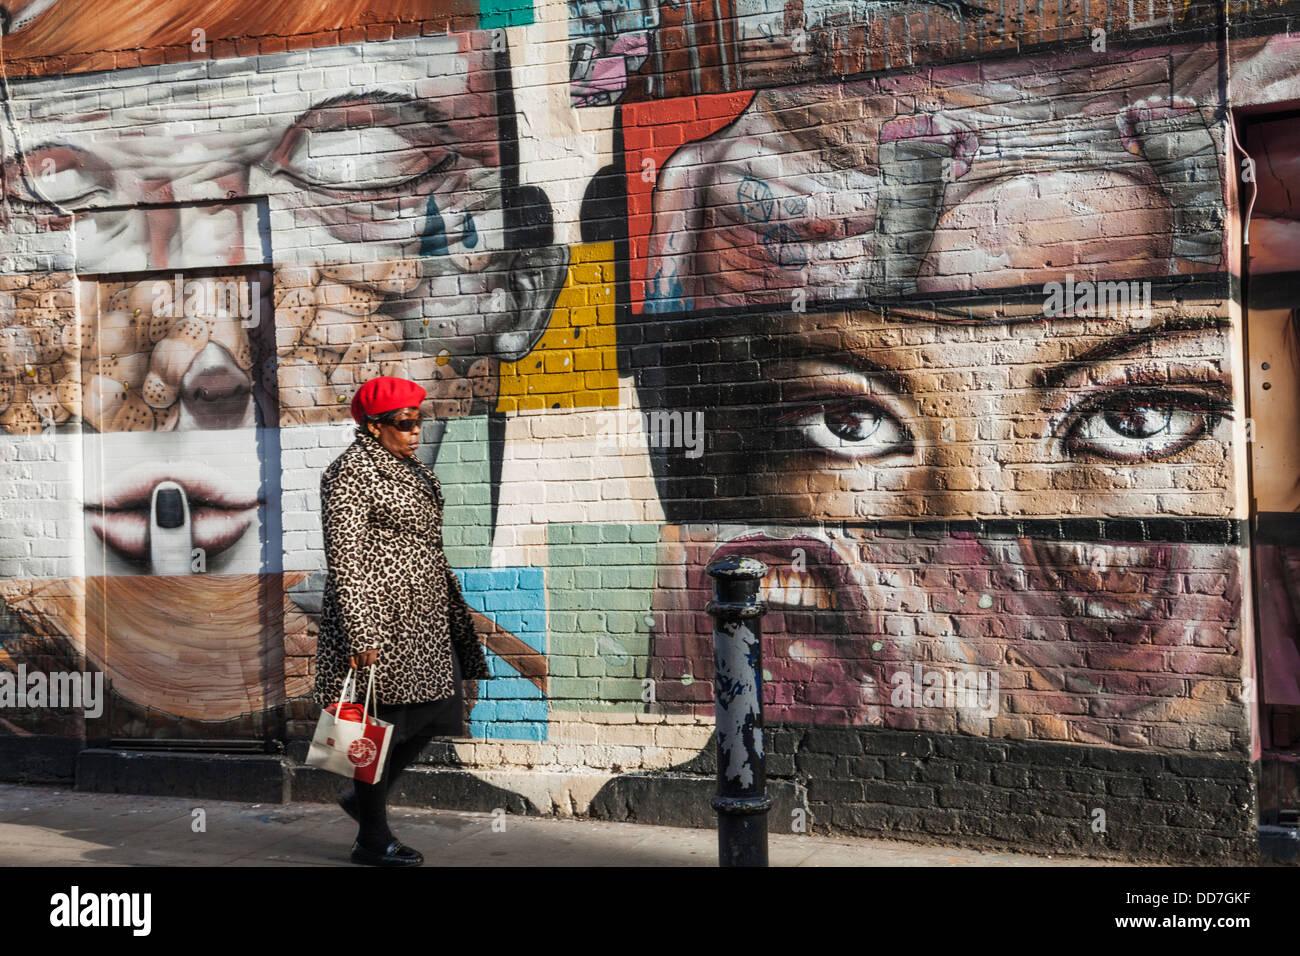 England London Shoreditch Brick Lane Wall Mural Stock